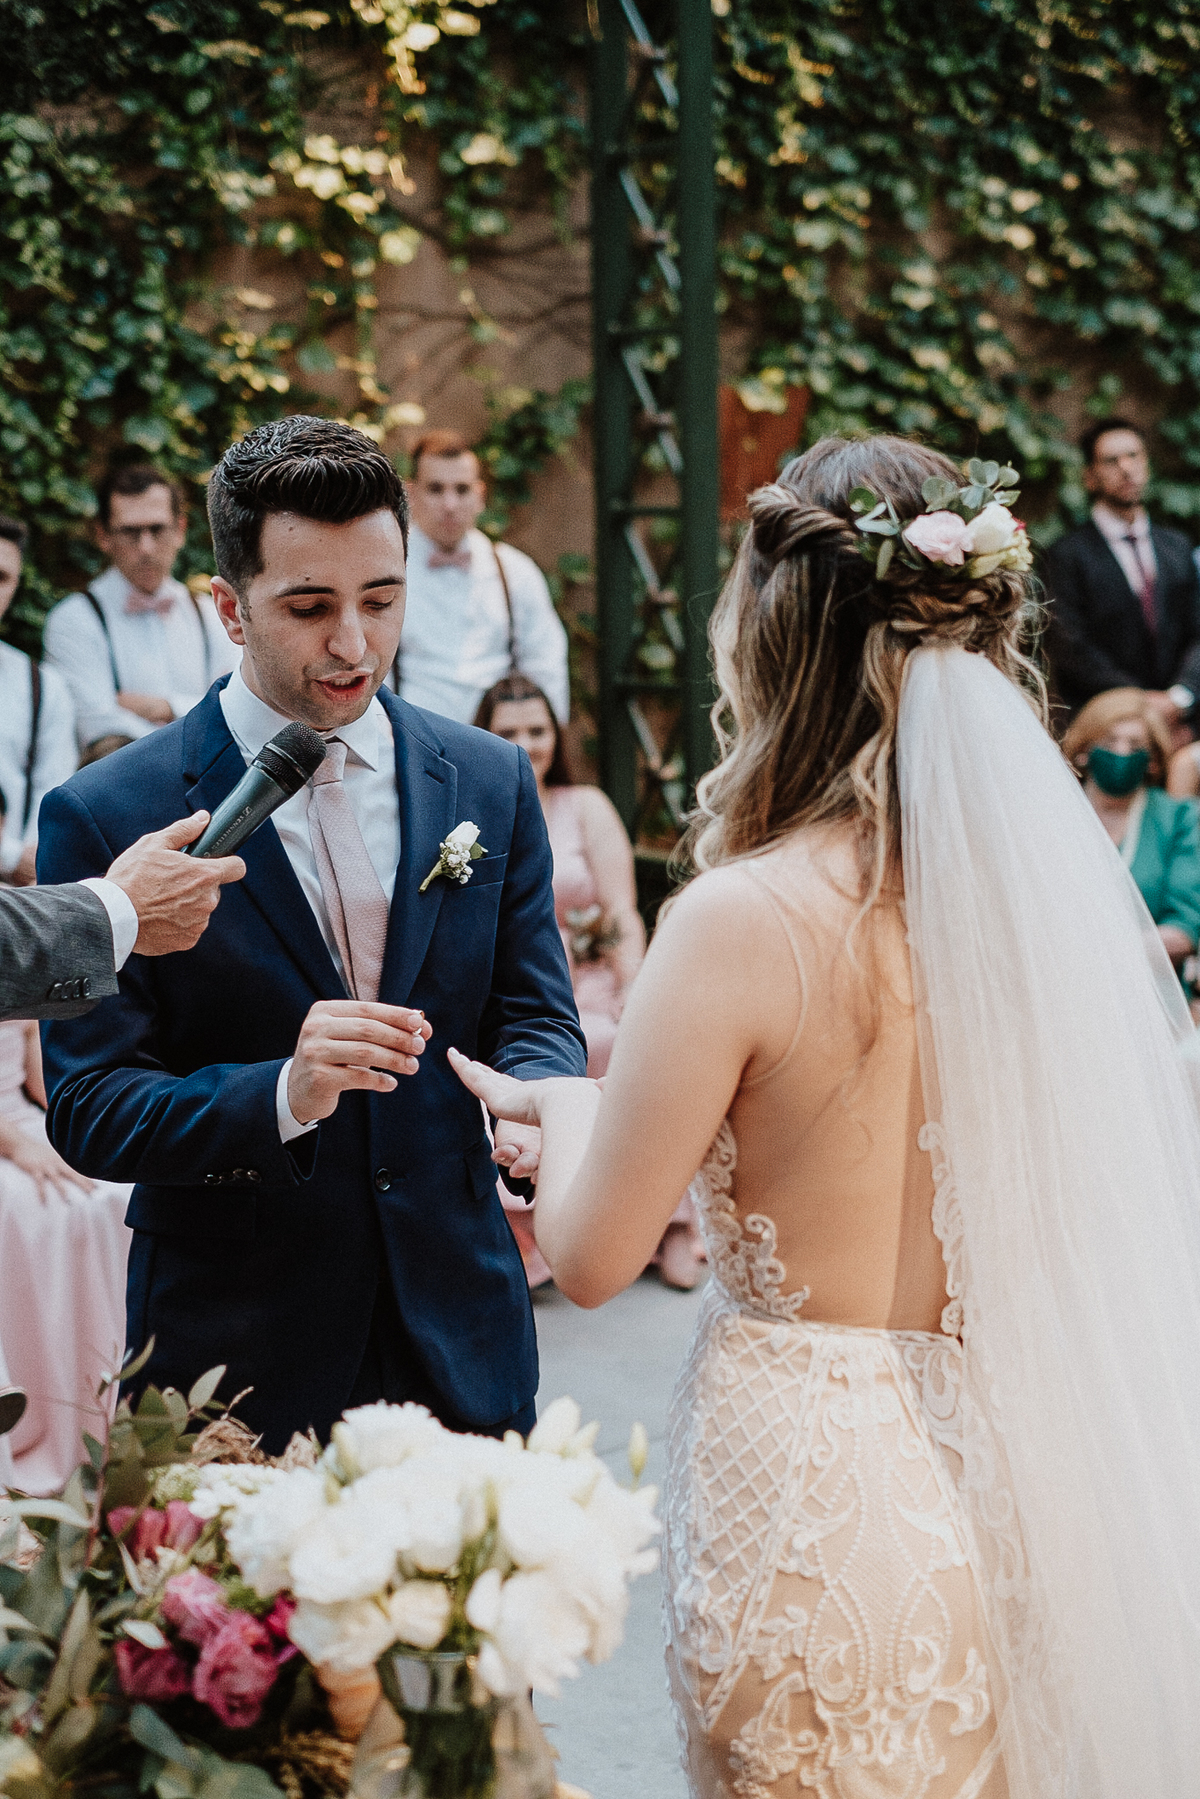 votos do casal fotos por caio henrique cerimonia no campo sitio sao jorge casamento cristao entrada das aliancas fotos por caio henrique